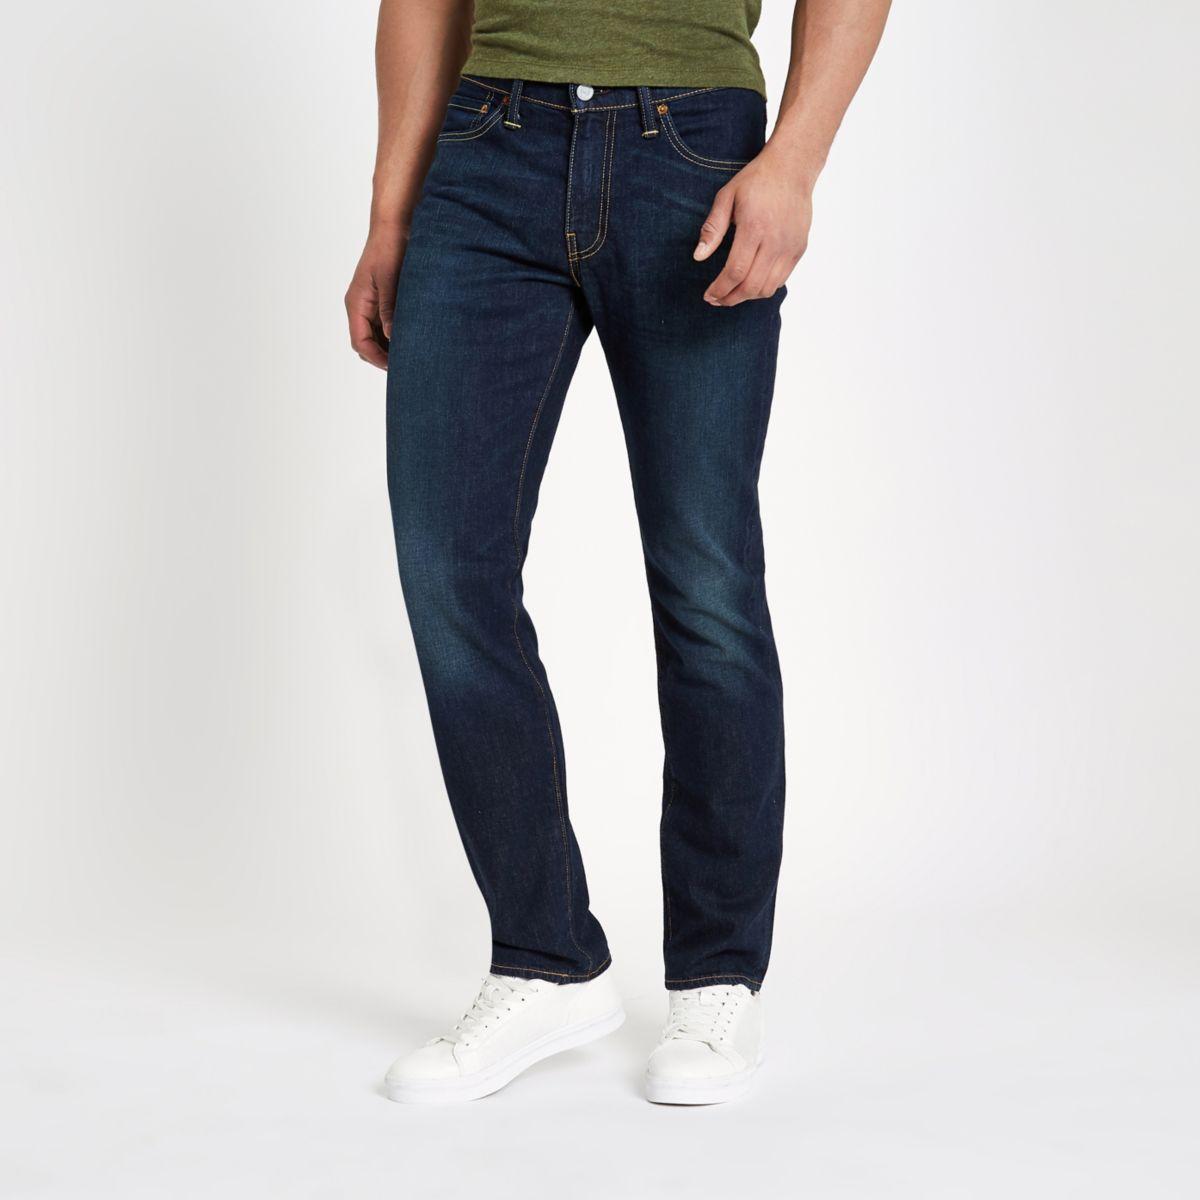 Levi's dark blue 511 slim fit jeans